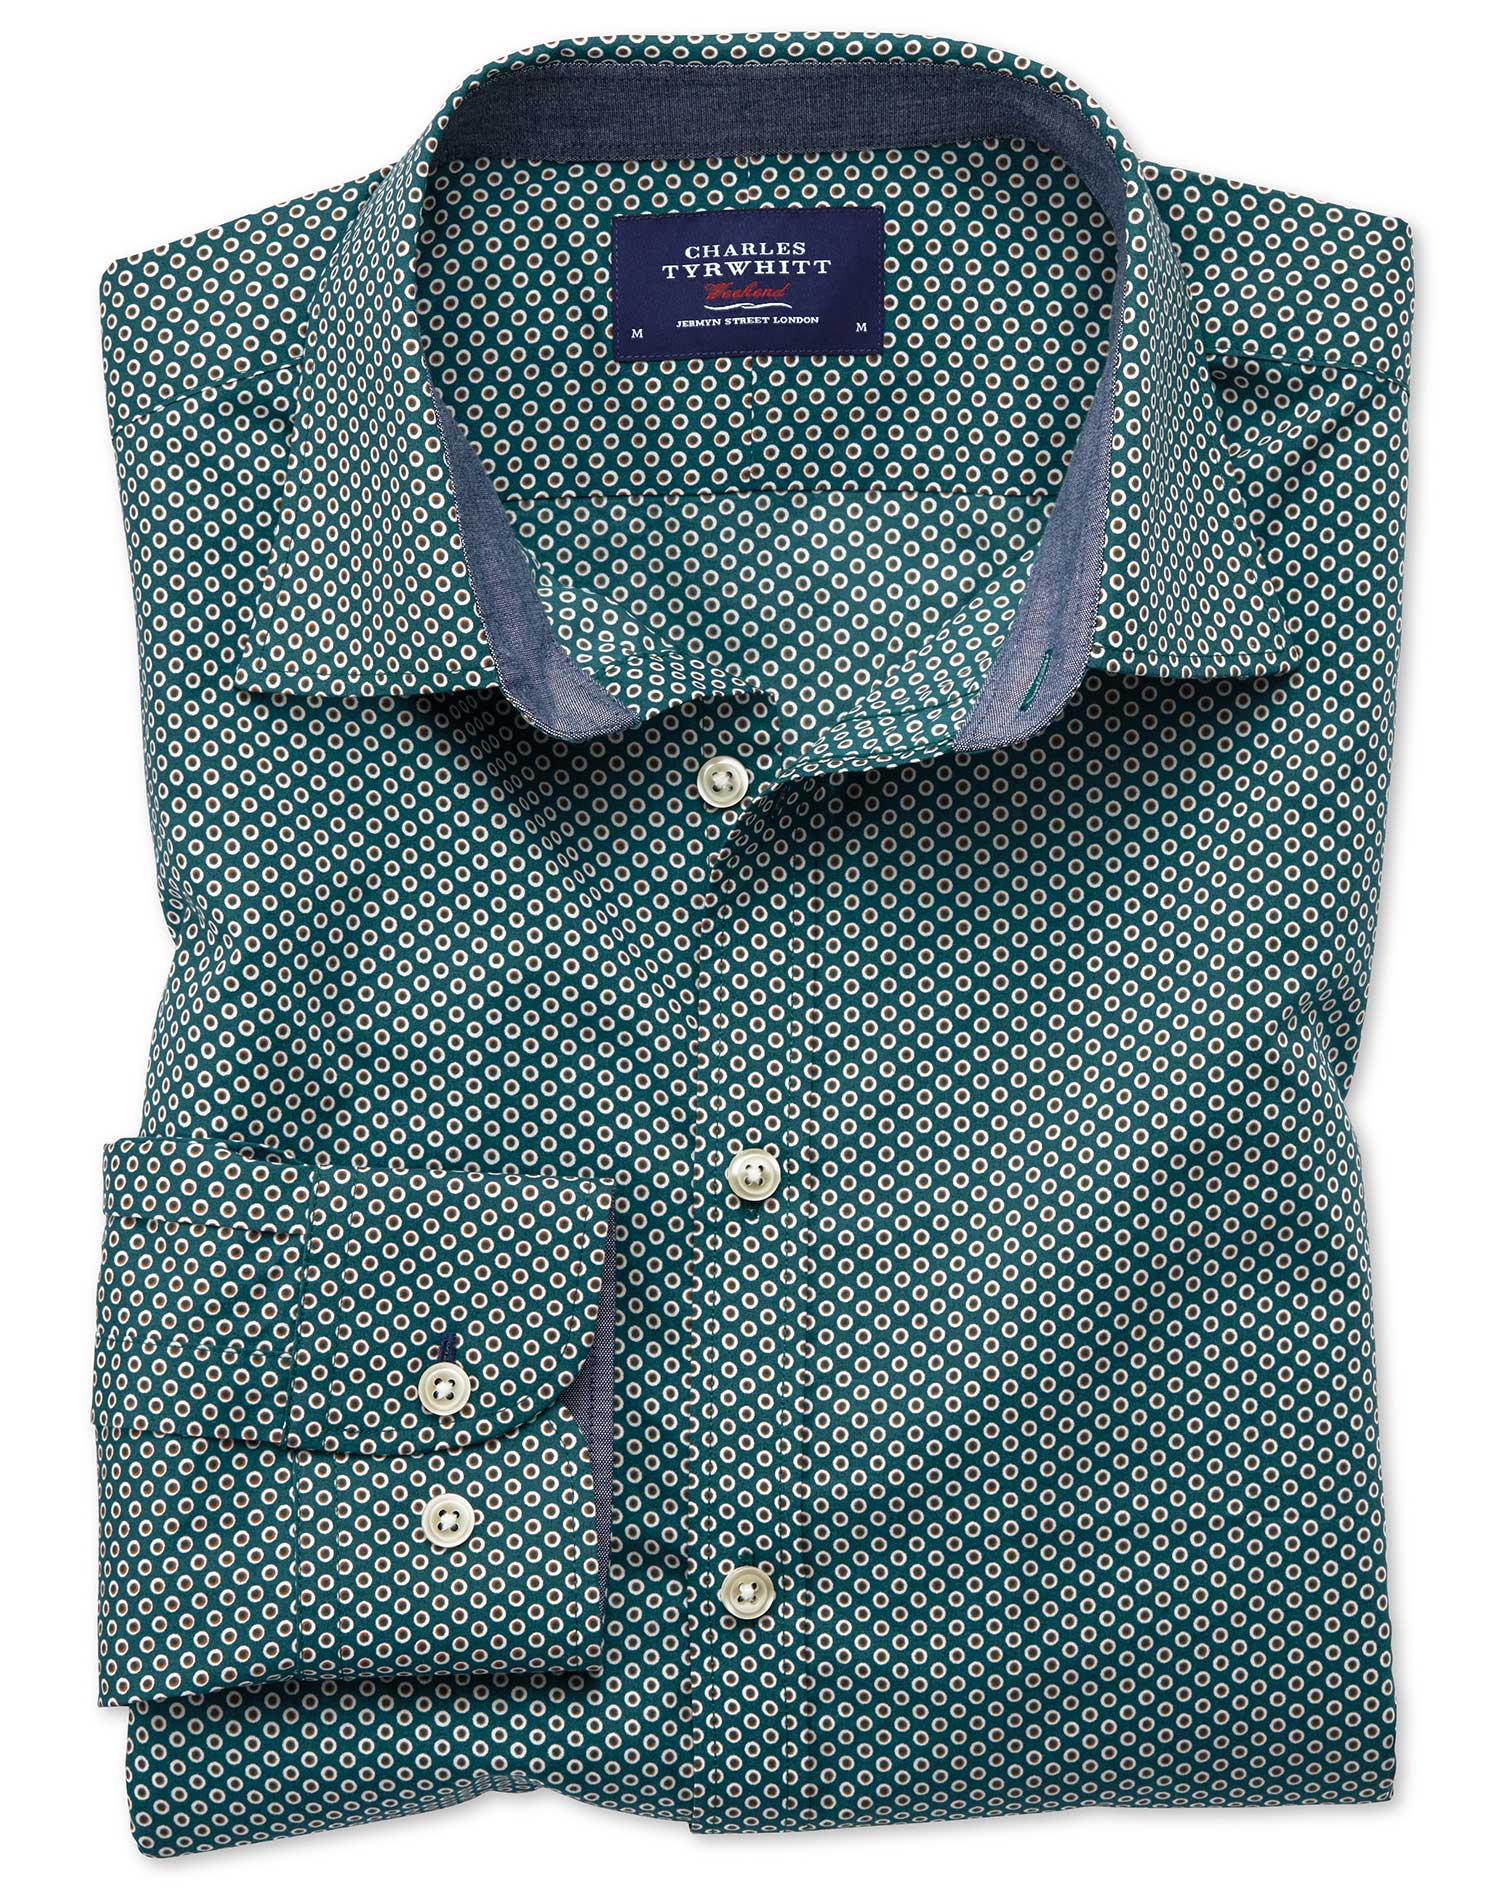 Classic Fit Dark Green Spot Print Cotton Shirt Single Cuff Size Small by Charles Tyrwhitt